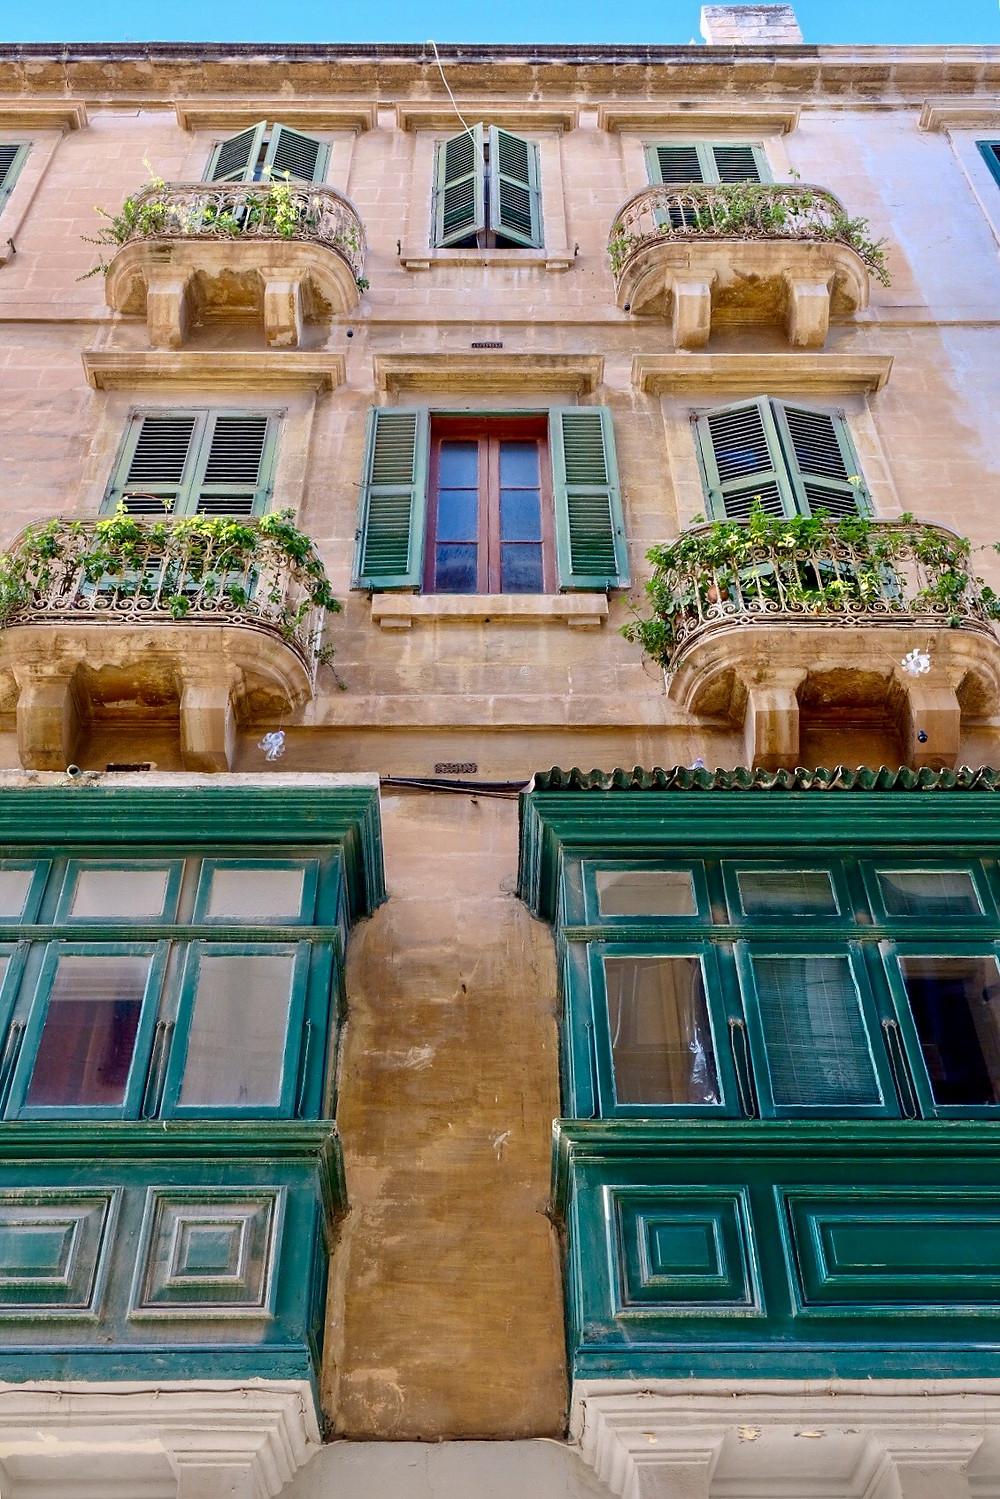 Wooden balconies in Valletta, Malta